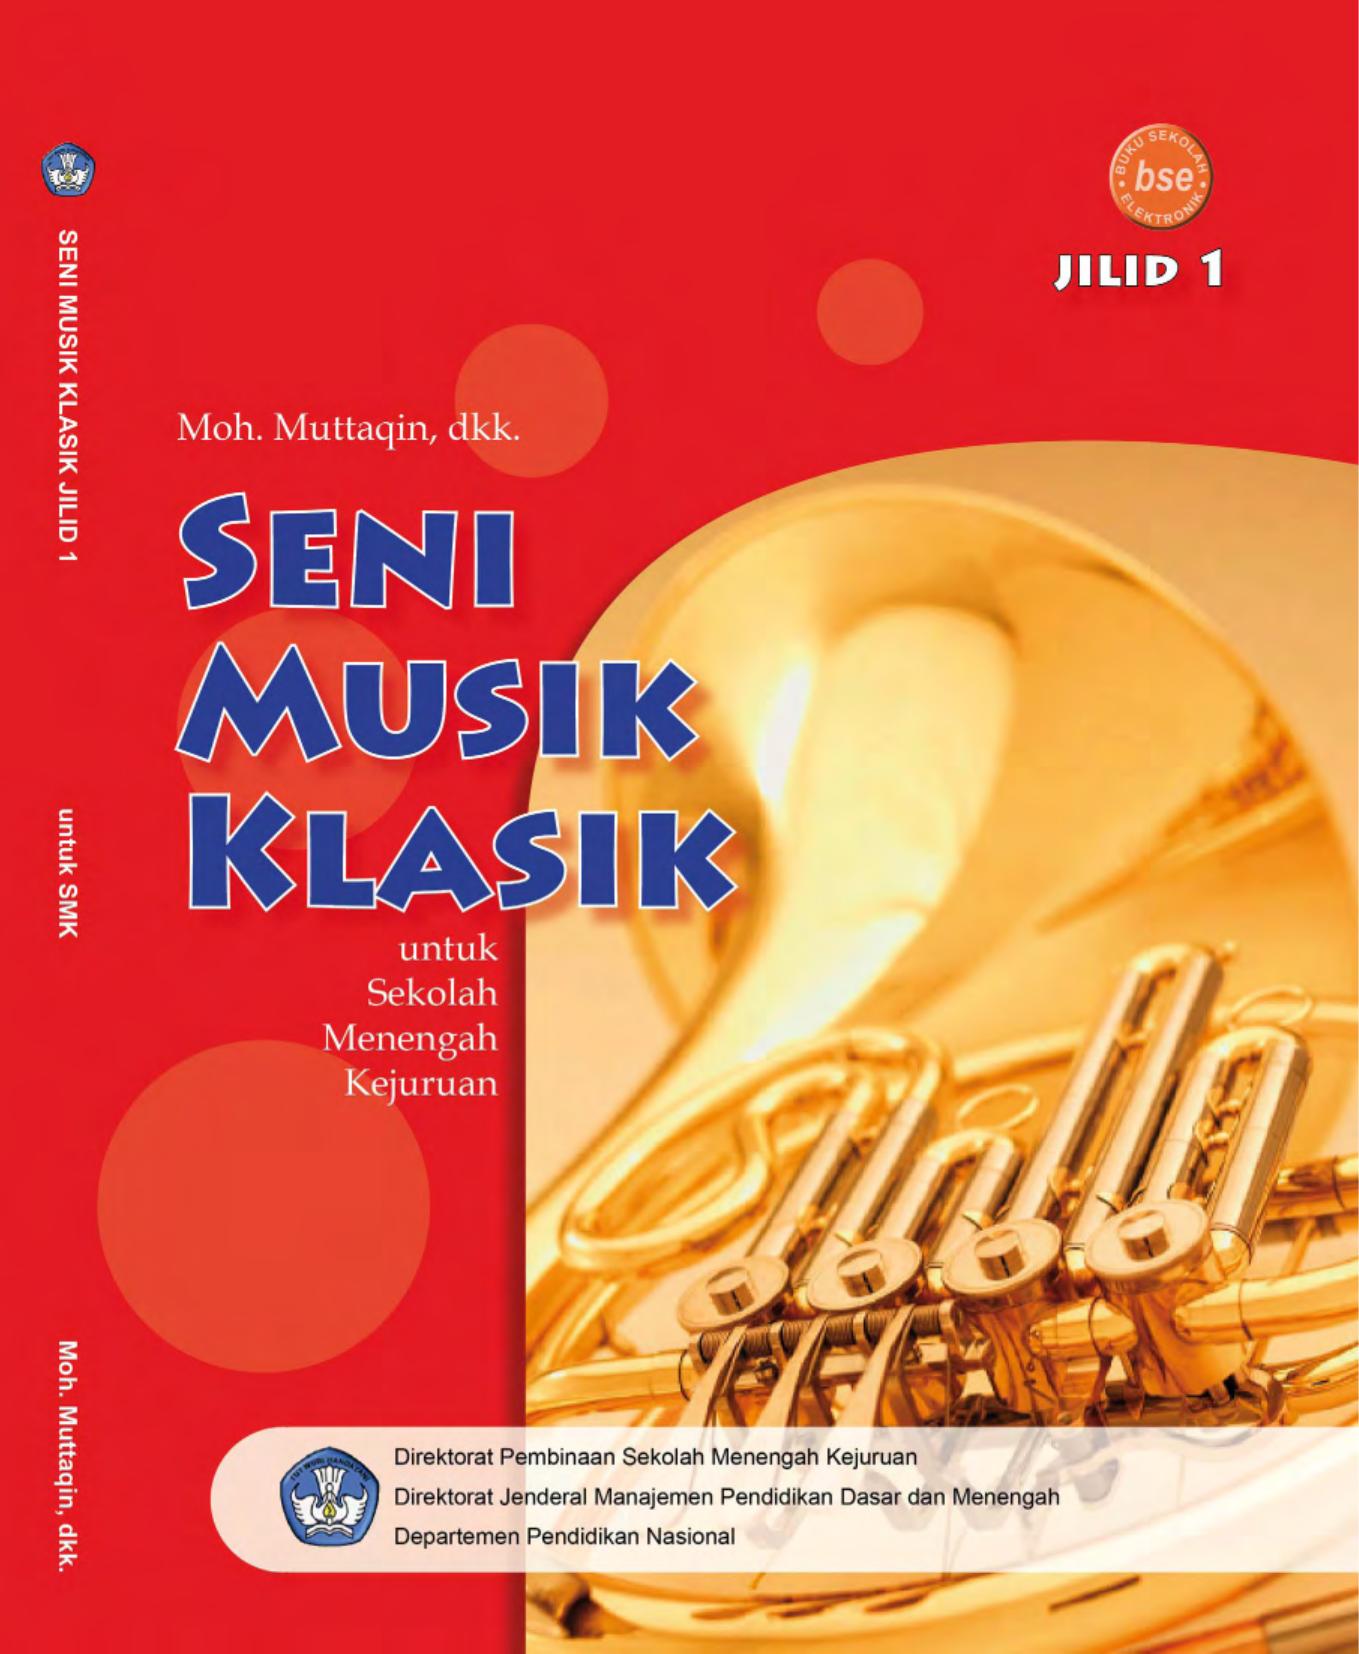 Seni Musik Klasik Jilid 1 Smk E Learning Sekolah Menengah